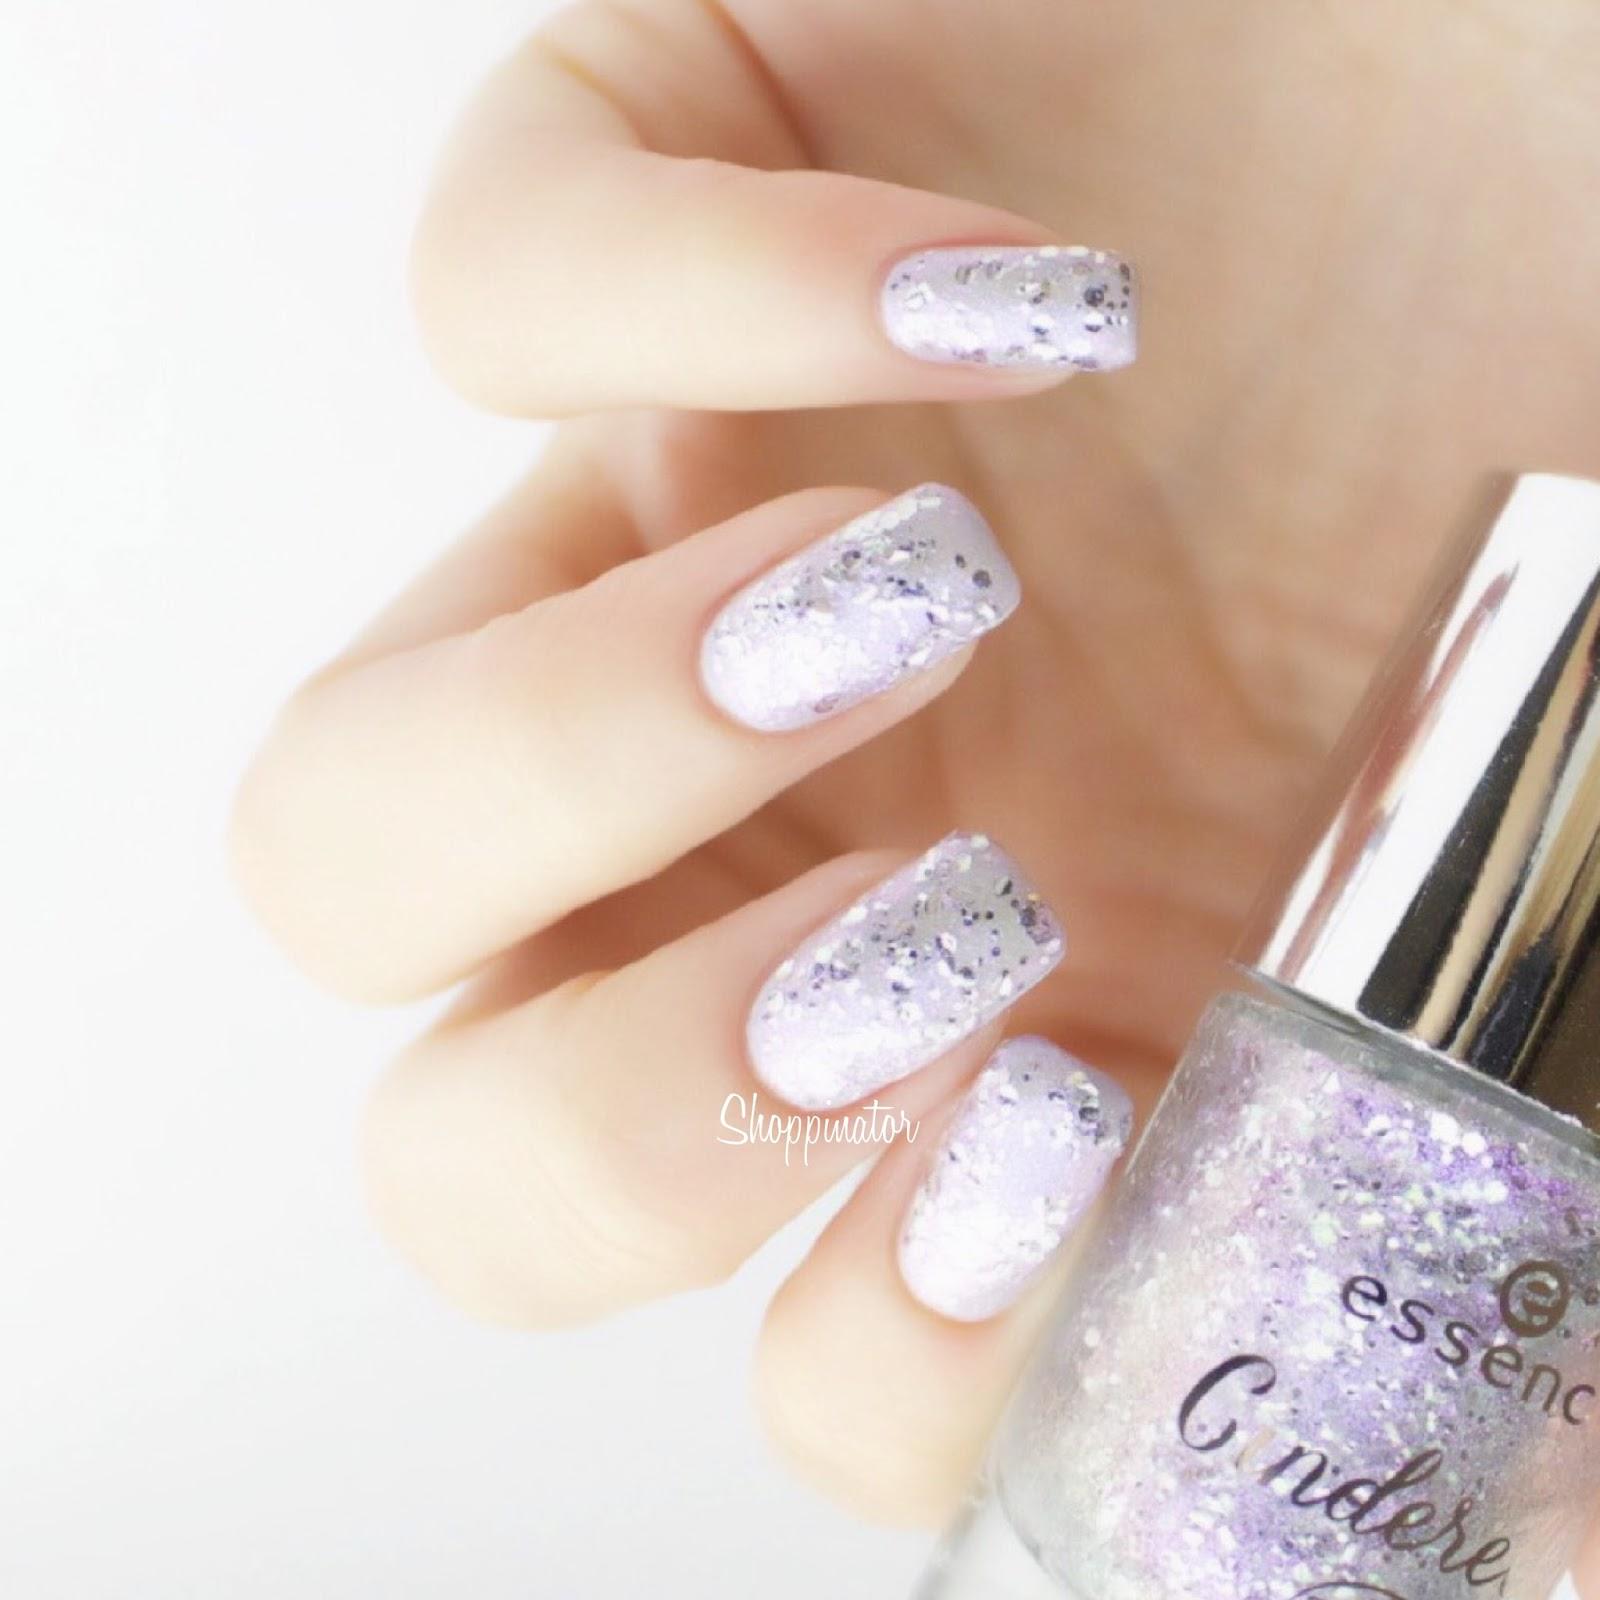 Essence-Cinderella-Disney-Shoppinator-Nagellack-Glitzerlack-Topper-The-Glass-Slipper-Watch-Out-Lady-Tremaine-Bibbidi-Bobbidi-Boo-Prince-Charming-Sing-Sweet-Nightingale